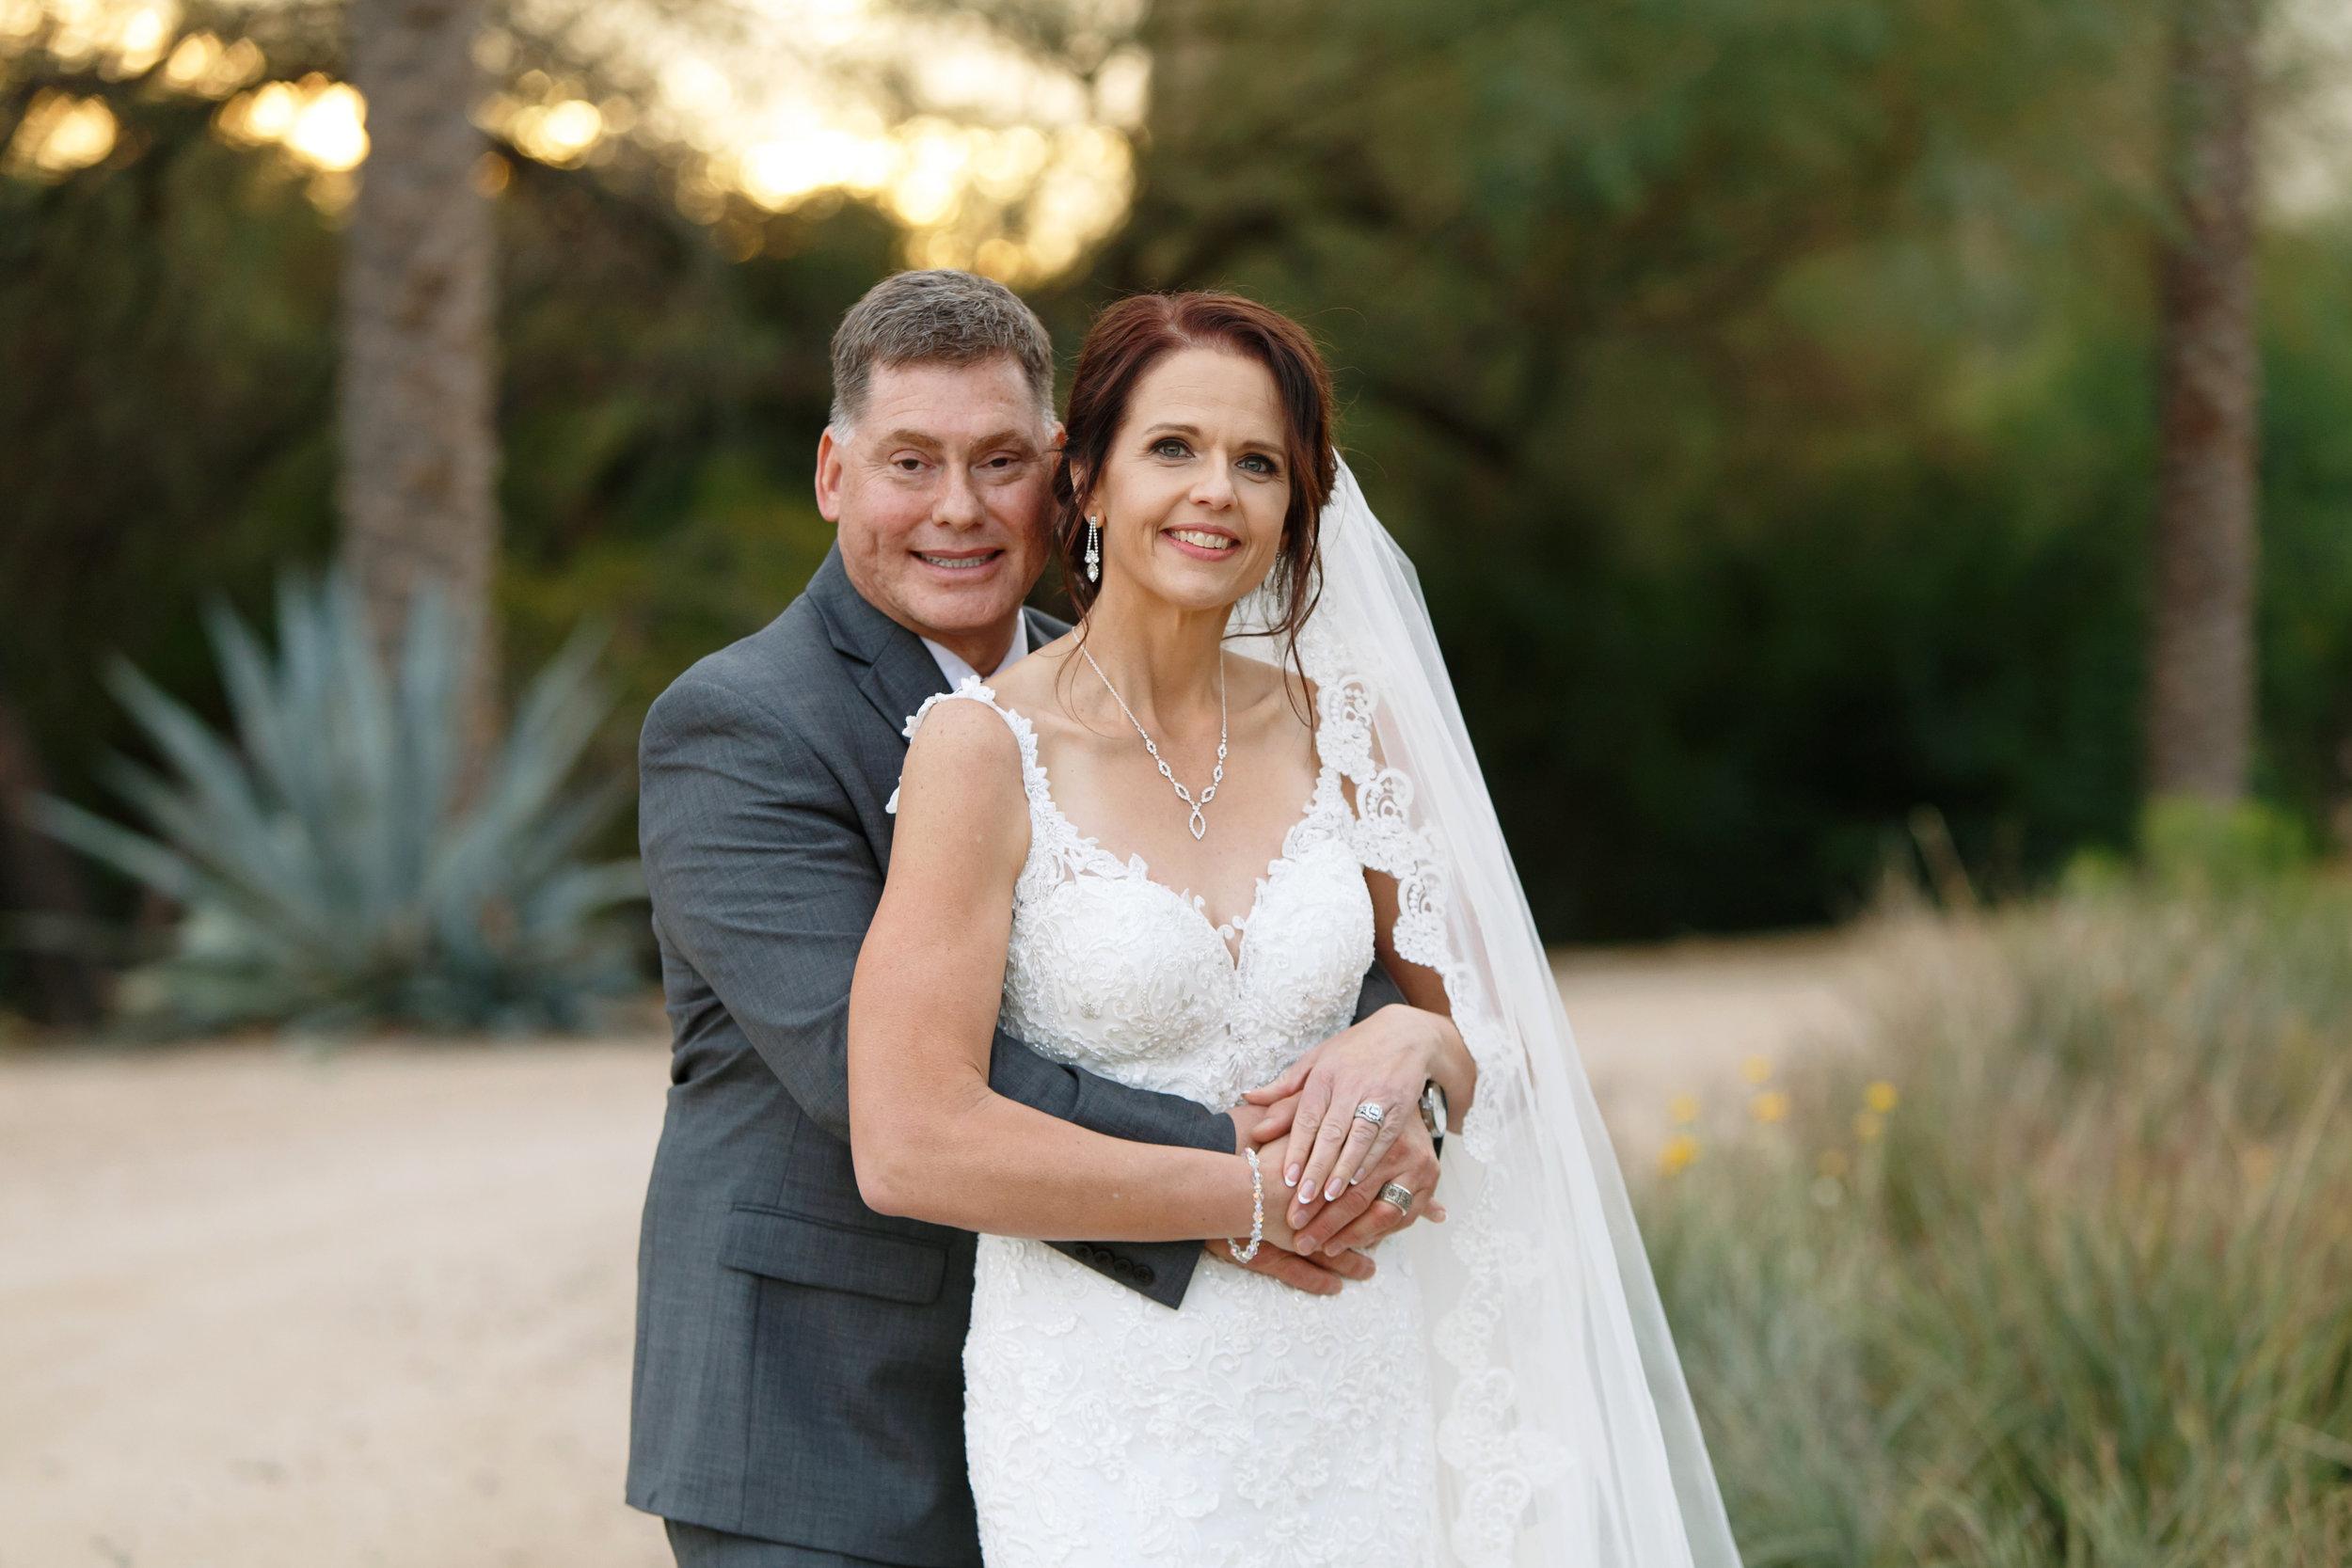 wedding_kathy-john-castro_f-470 copy.jpg